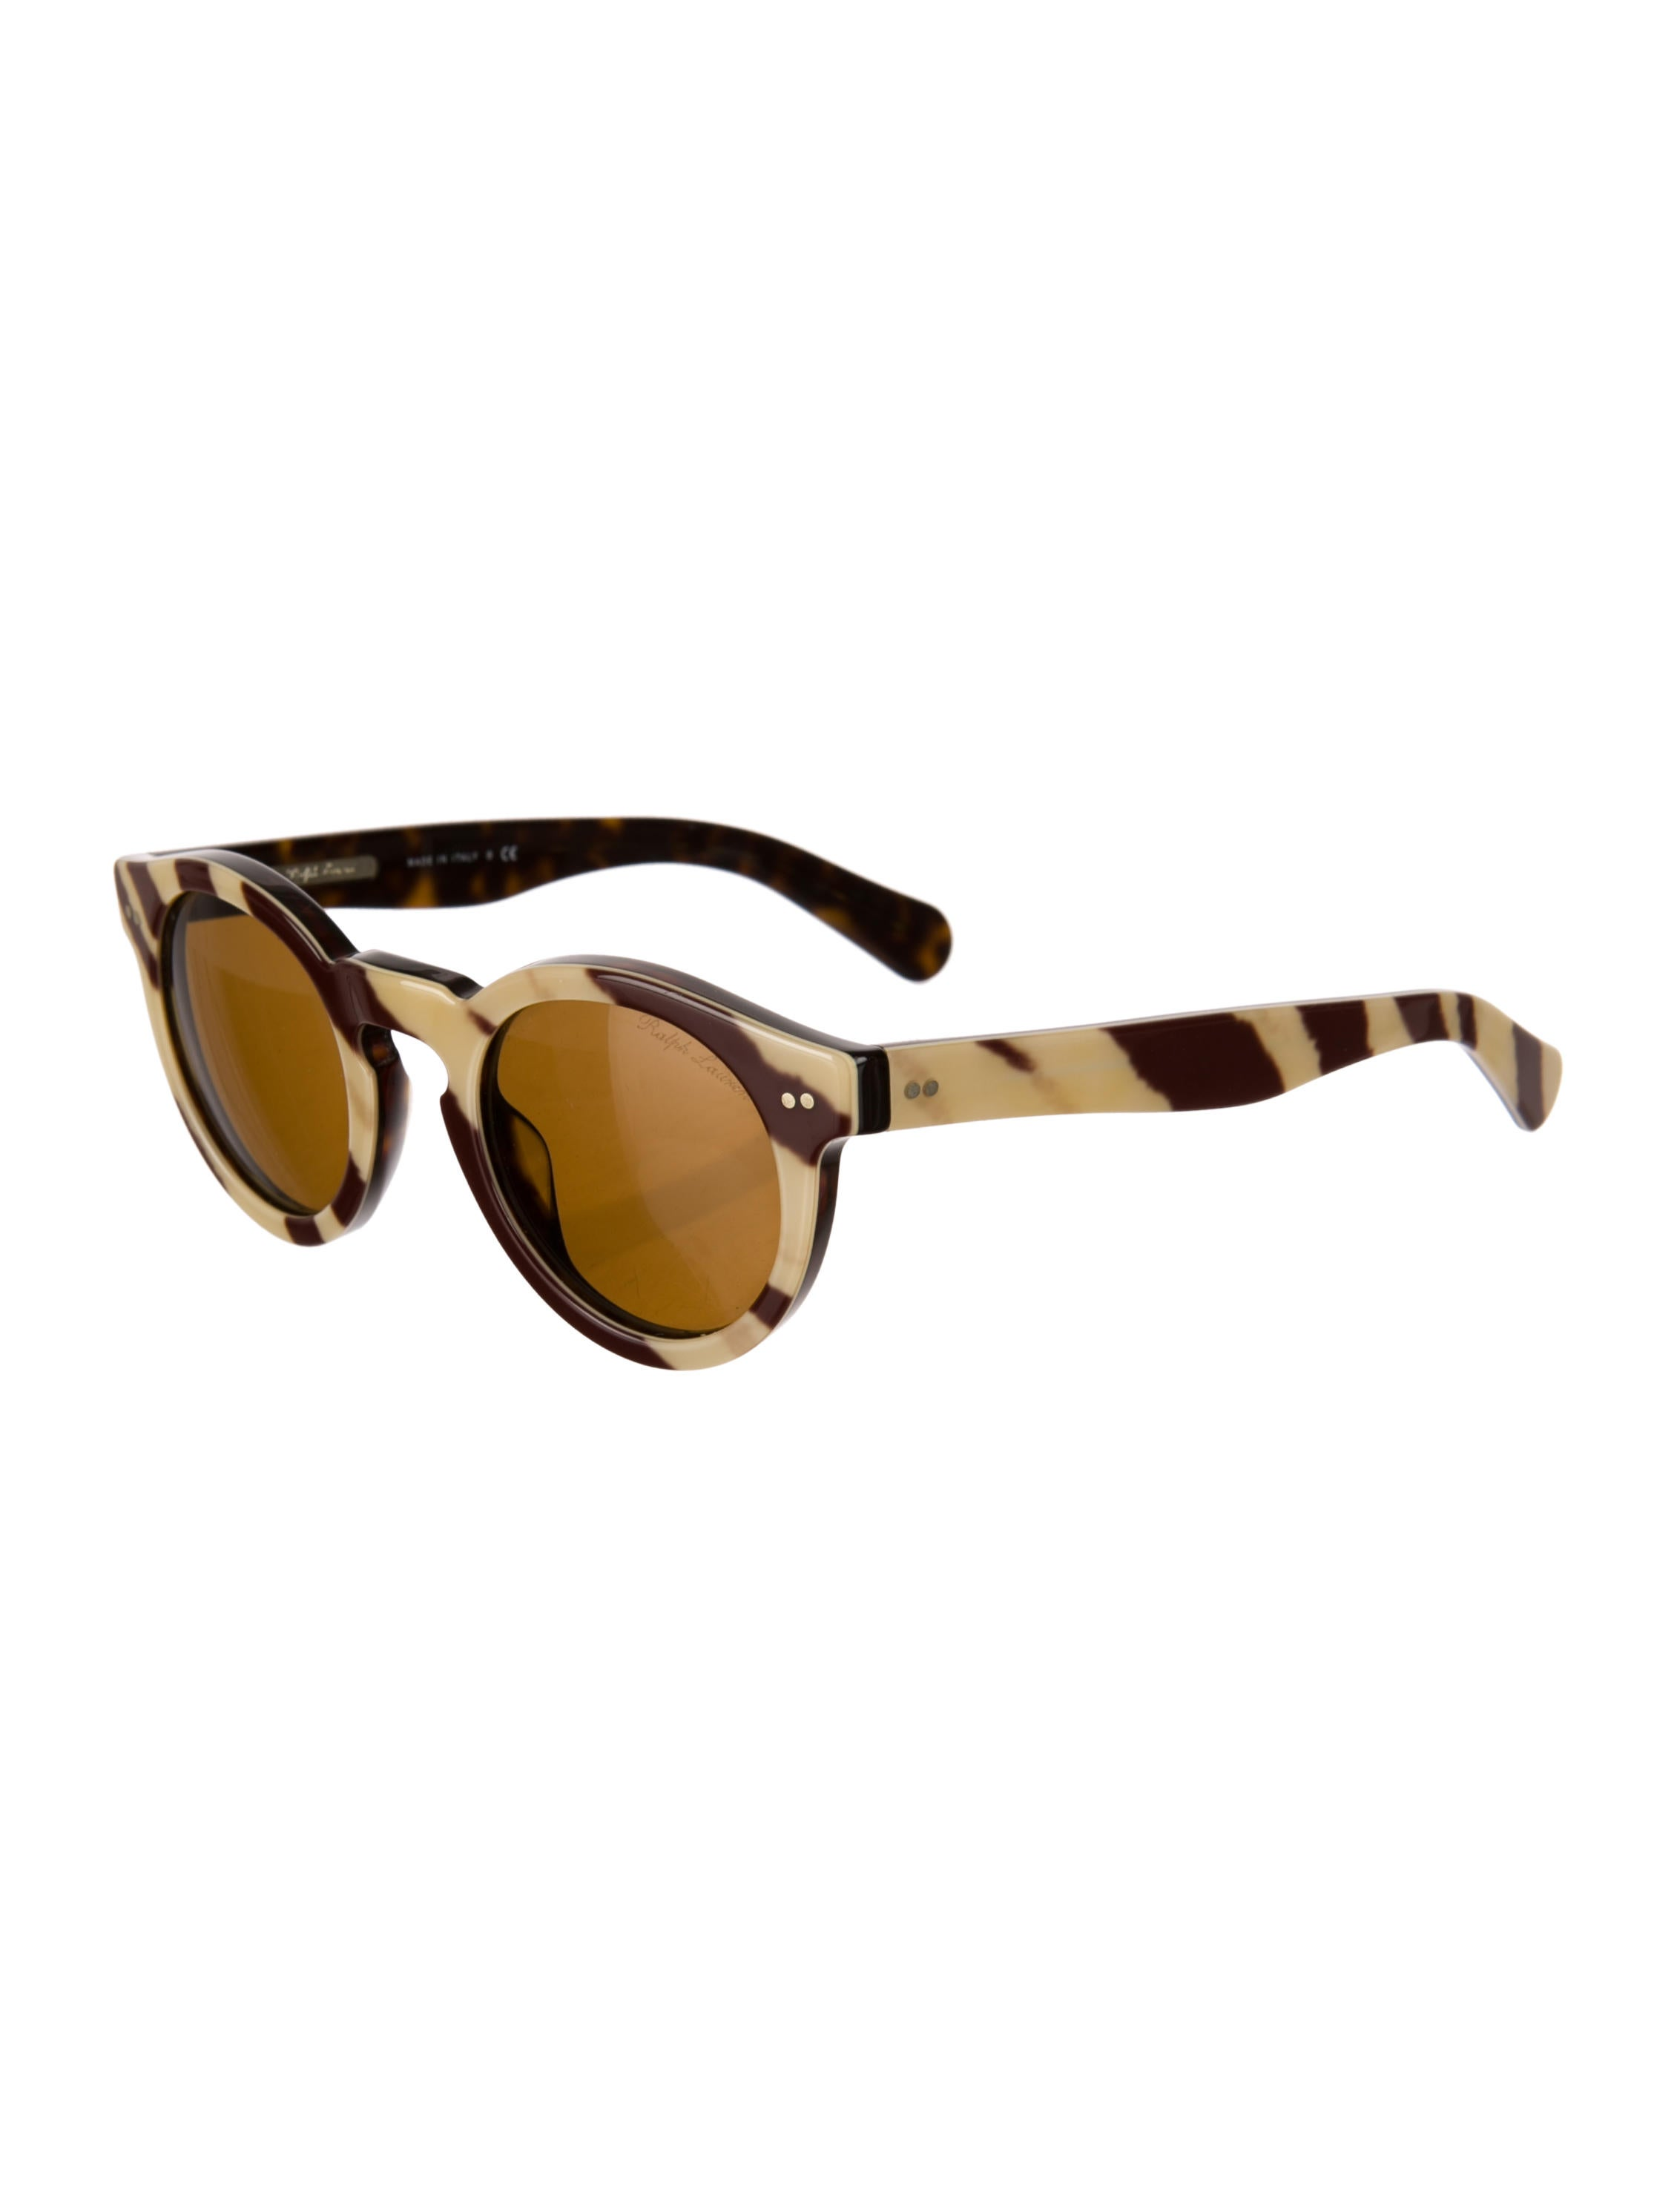 ralph lauren collection sunglasses accessories. Black Bedroom Furniture Sets. Home Design Ideas